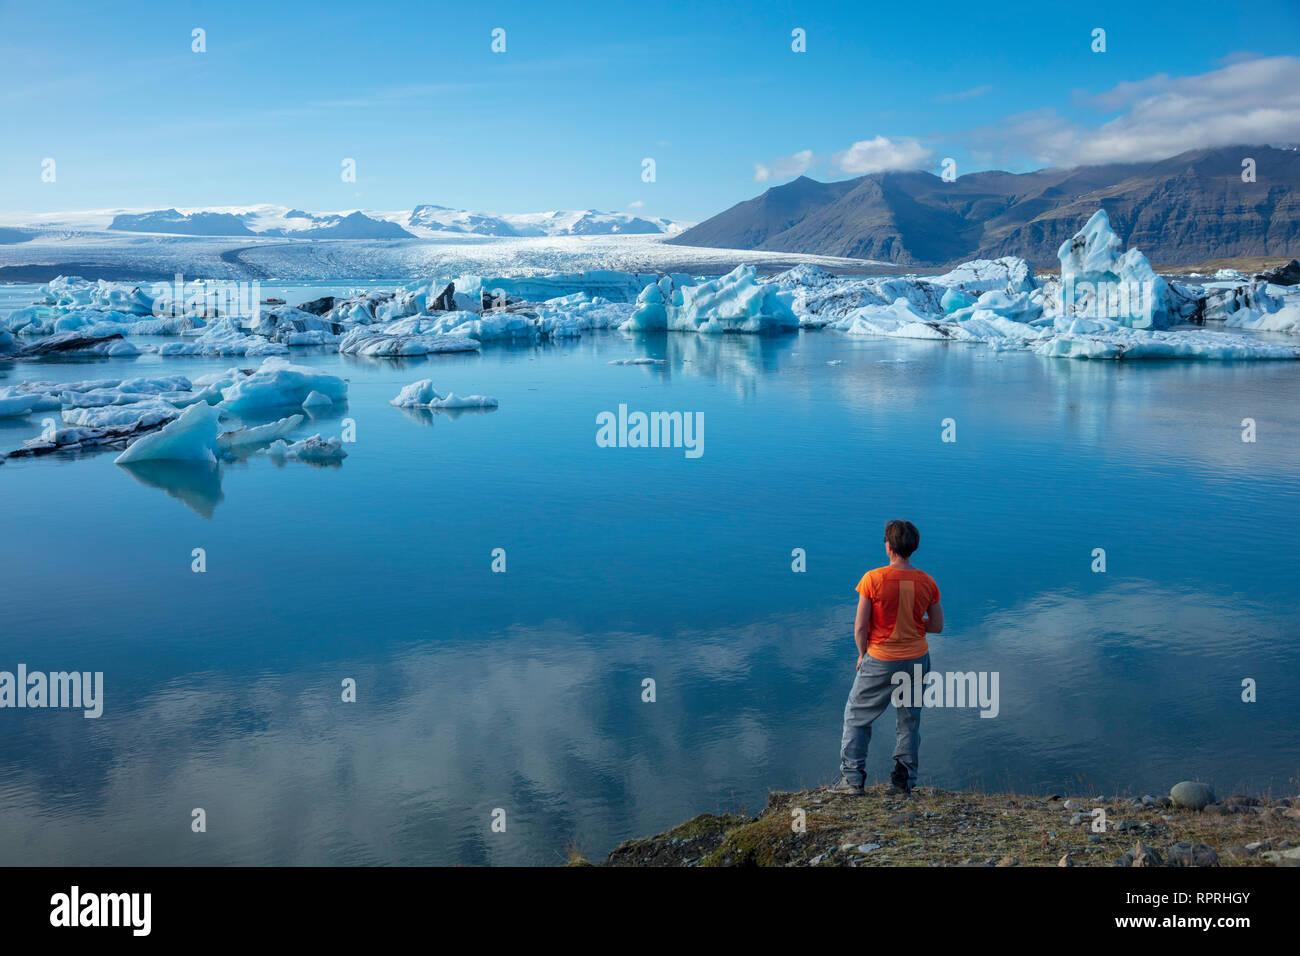 Person on the shore of Jokulsarlon glacier lagoon, beneath Vatnajokull glacier. Vatnajokull National Park, Sudhurland, south east Iceland. Stock Photo